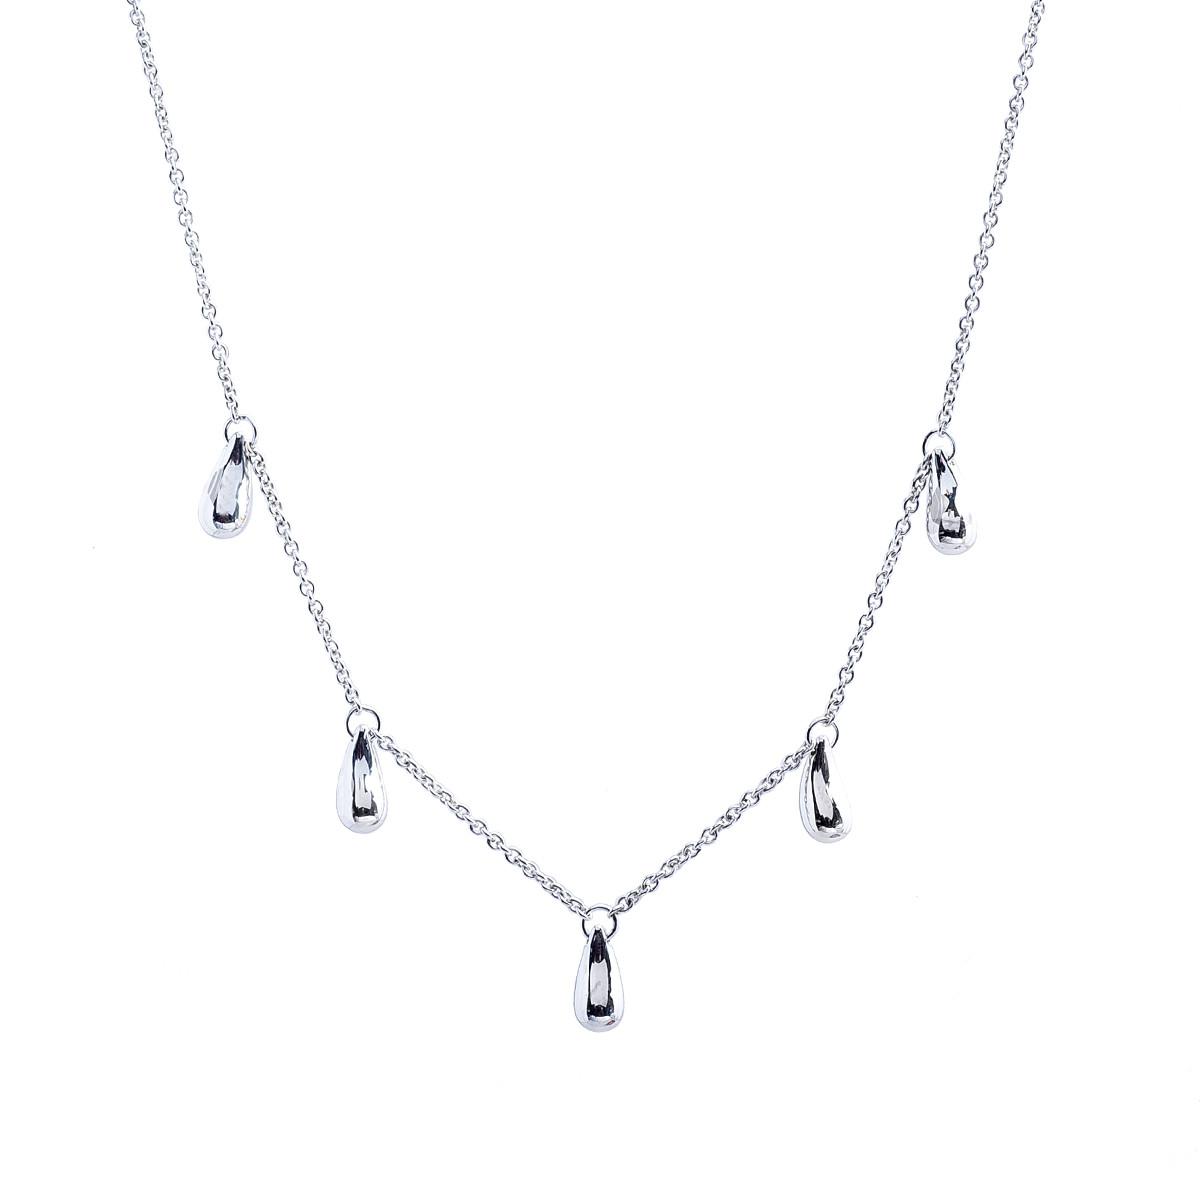 8d17302cc Vintage Tiffany & Co. Elsa Peretti Five Teardrop Necklace Gallery Image